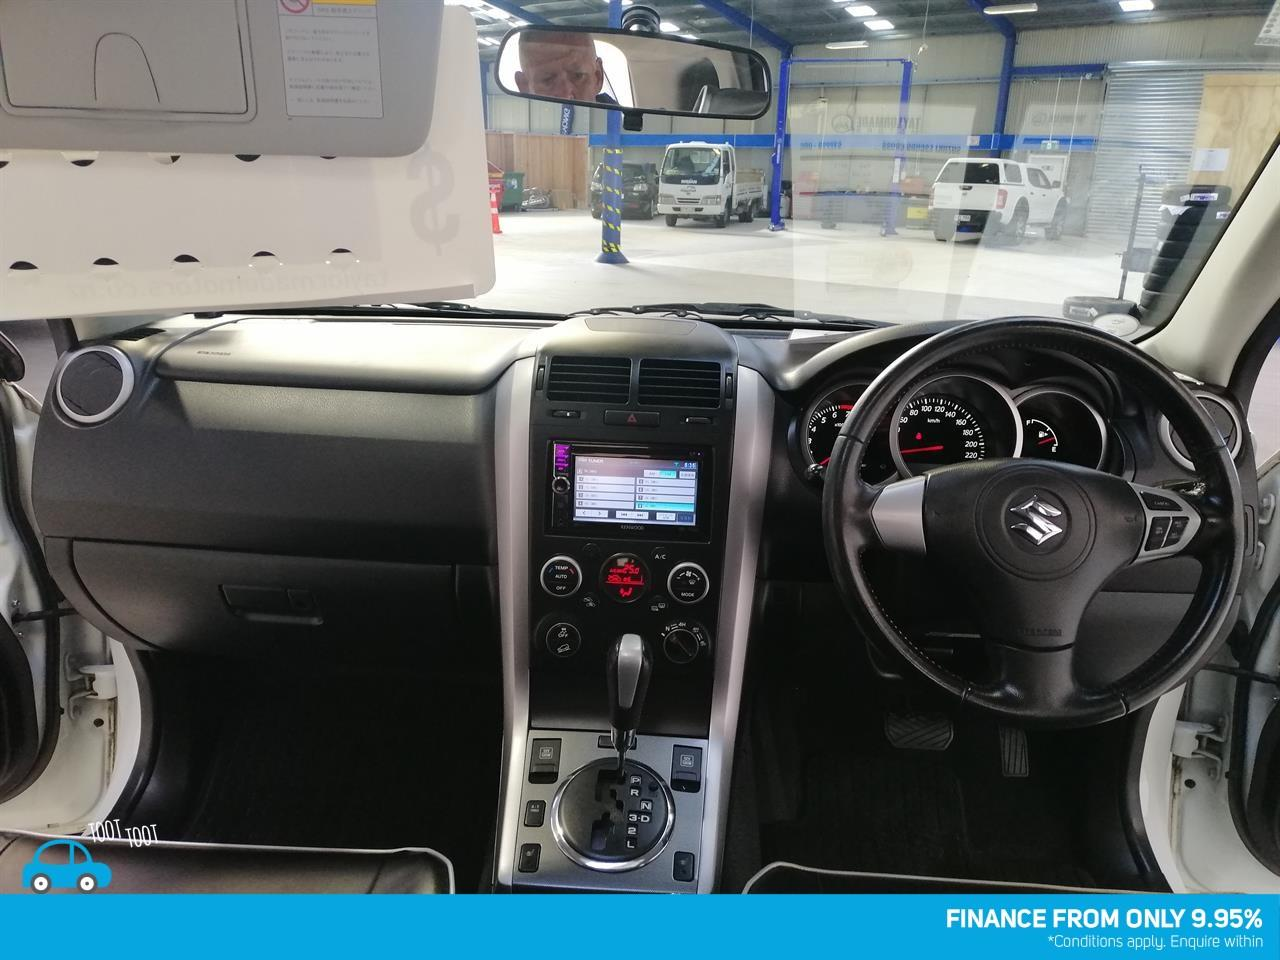 image-12, 2013 Suzuki ESCUDO CROSS ADVENTURE at Dunedin